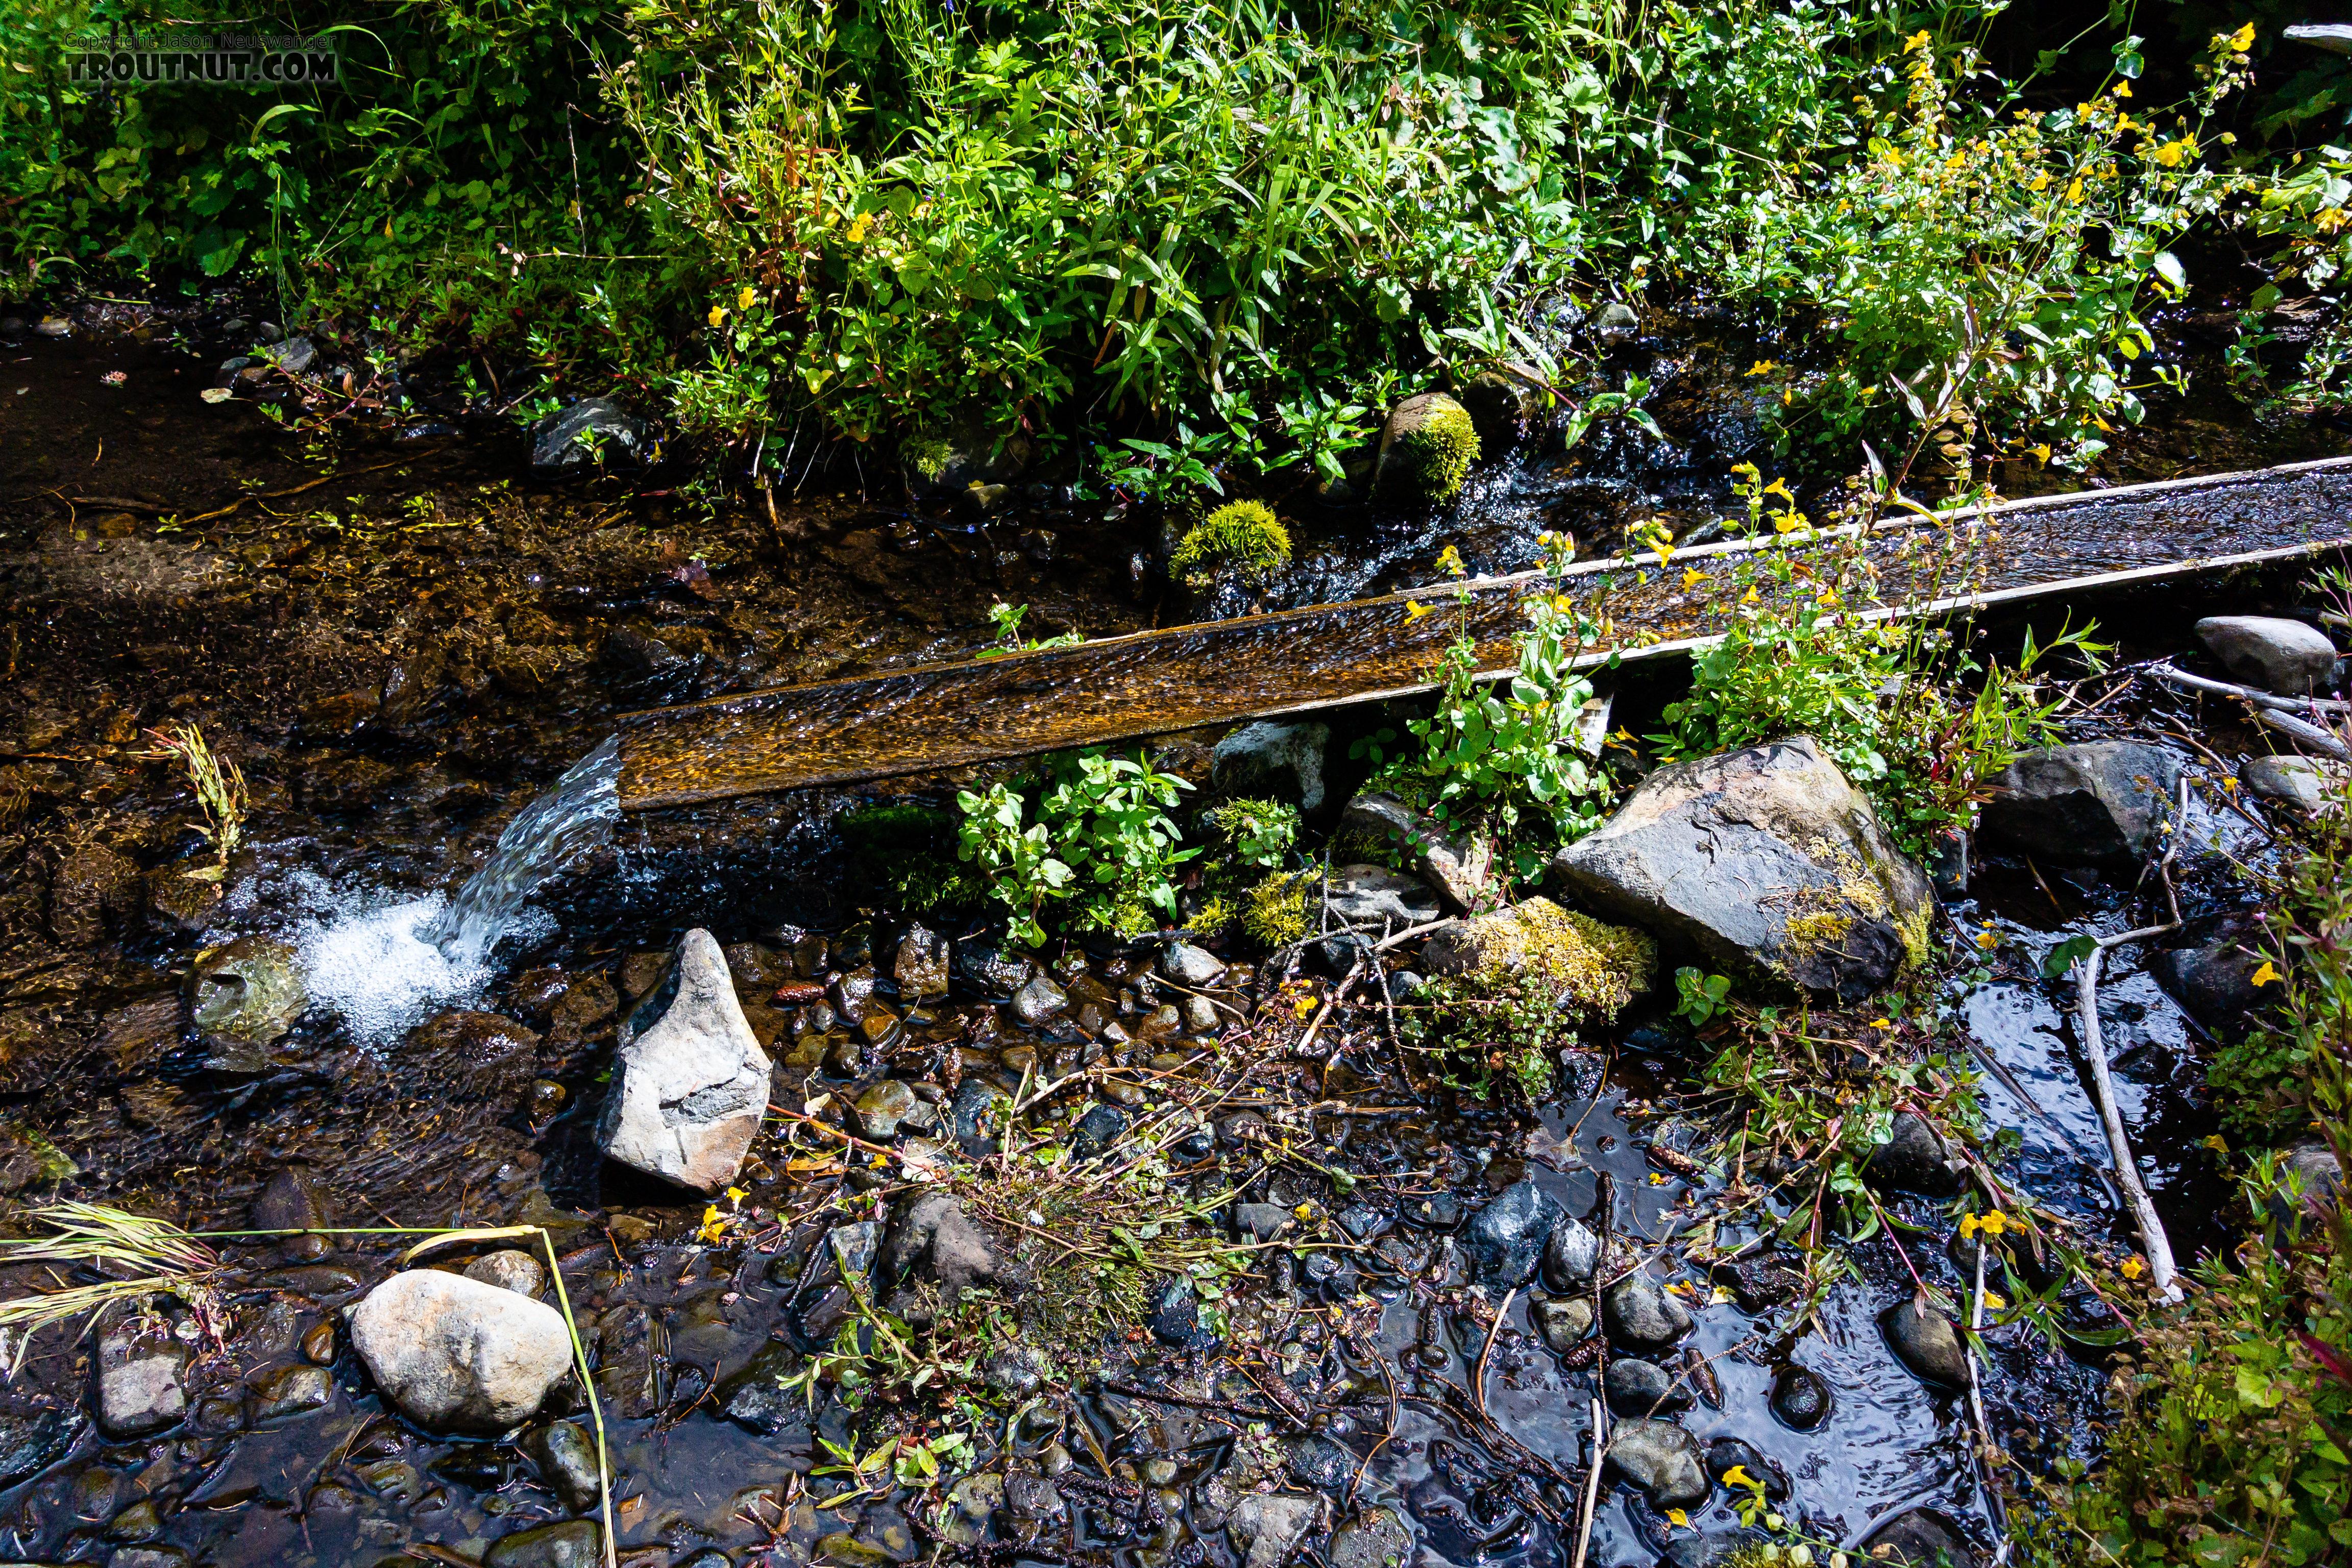 From Mystery Creek # 250 in Washington.